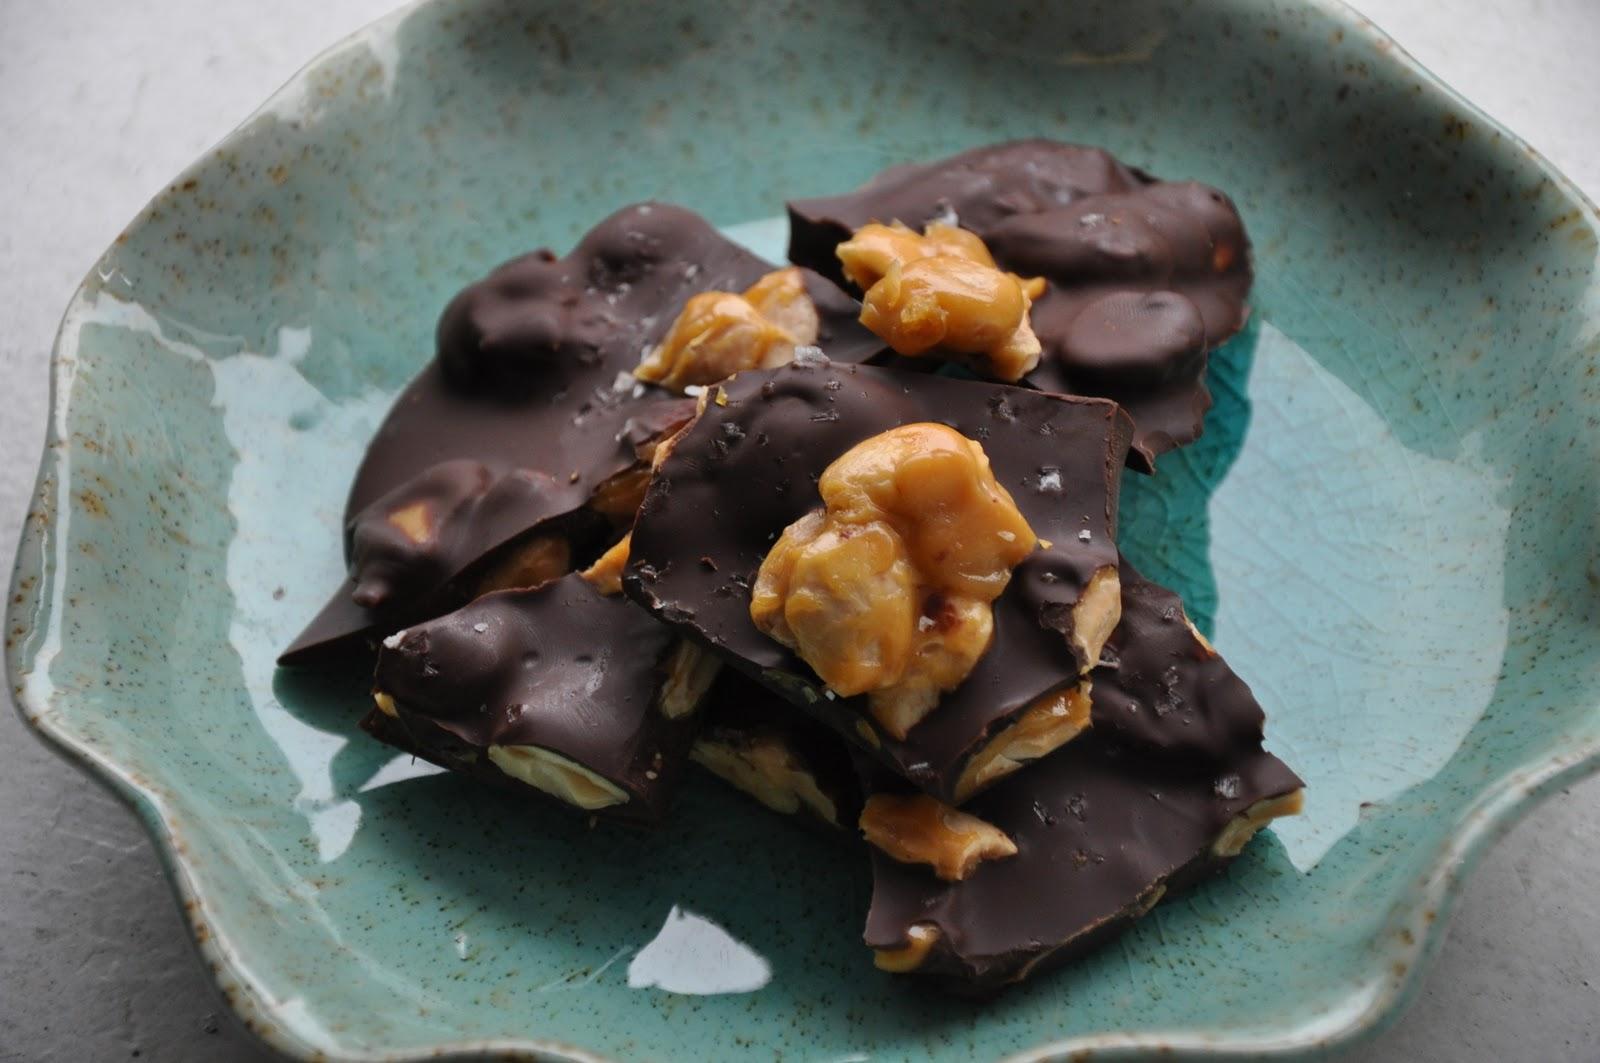 Slice of Rice: Chocolate Almond Bark with Sea Salt